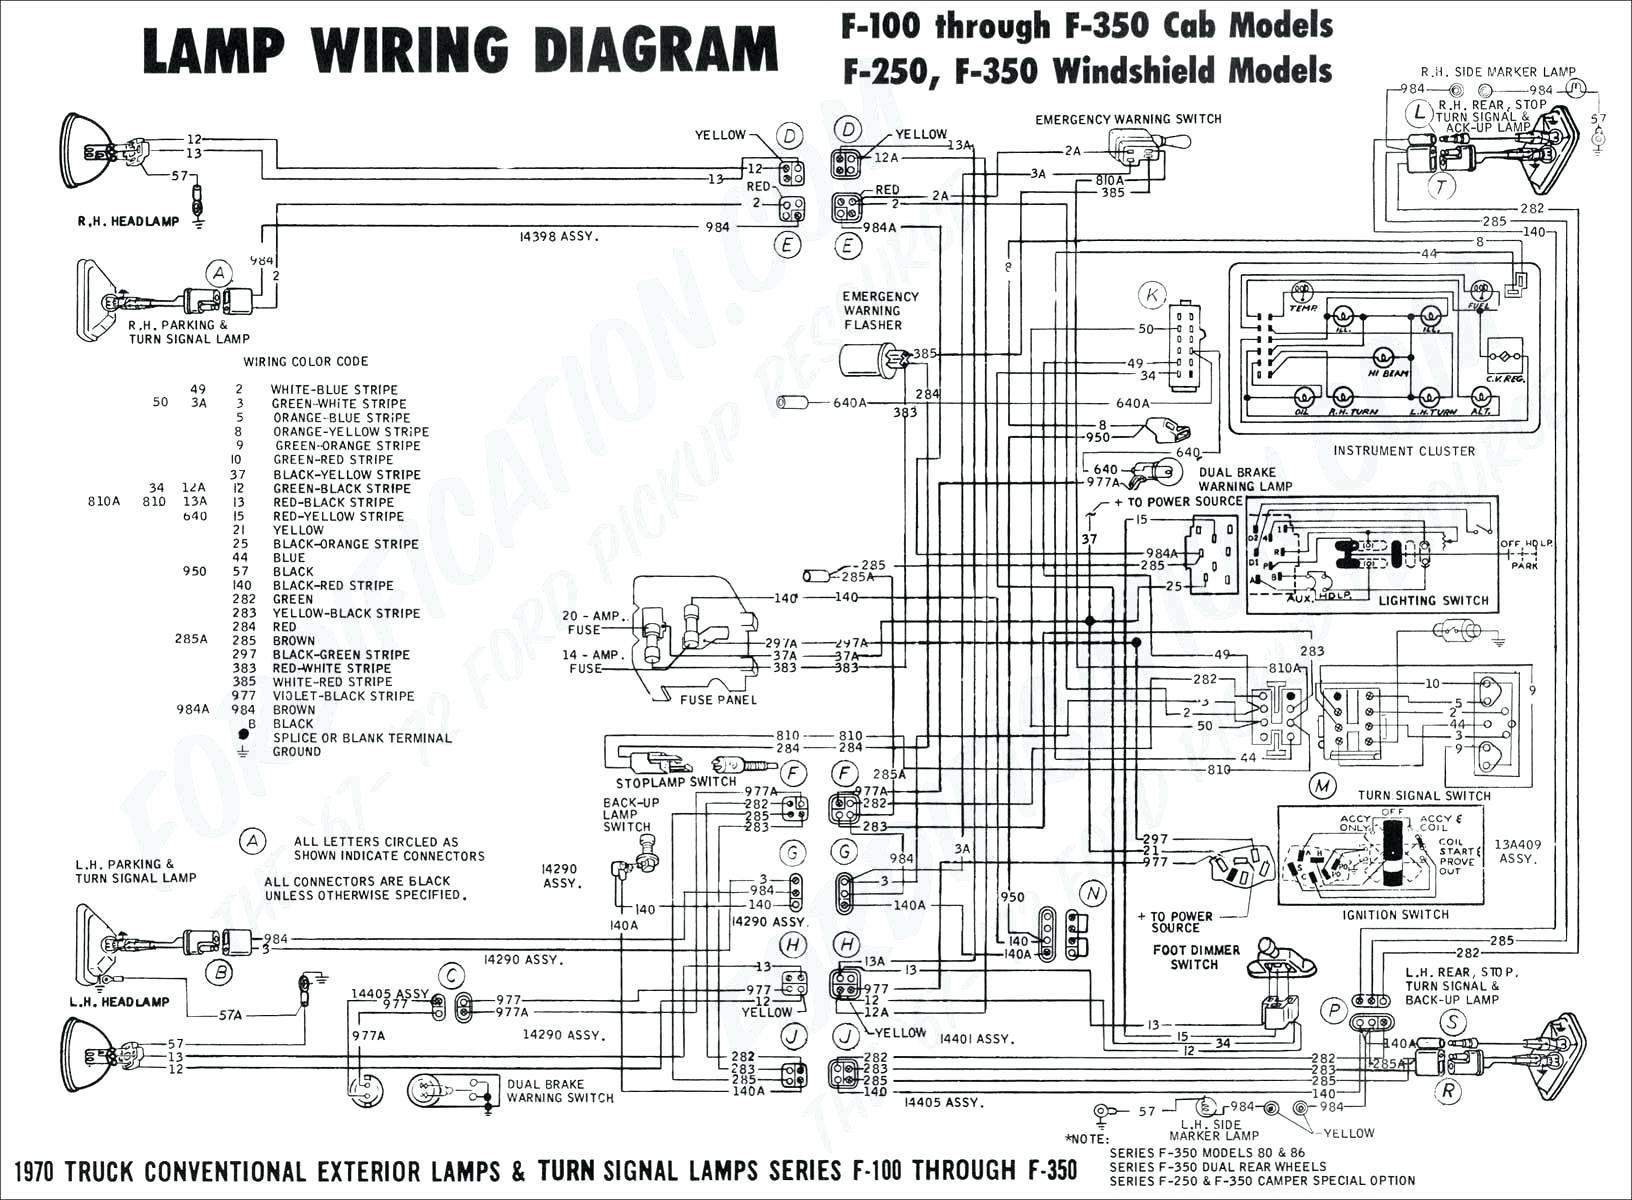 Toyota Wiring Harness Diagram 2000 toyota Corolla Wiring